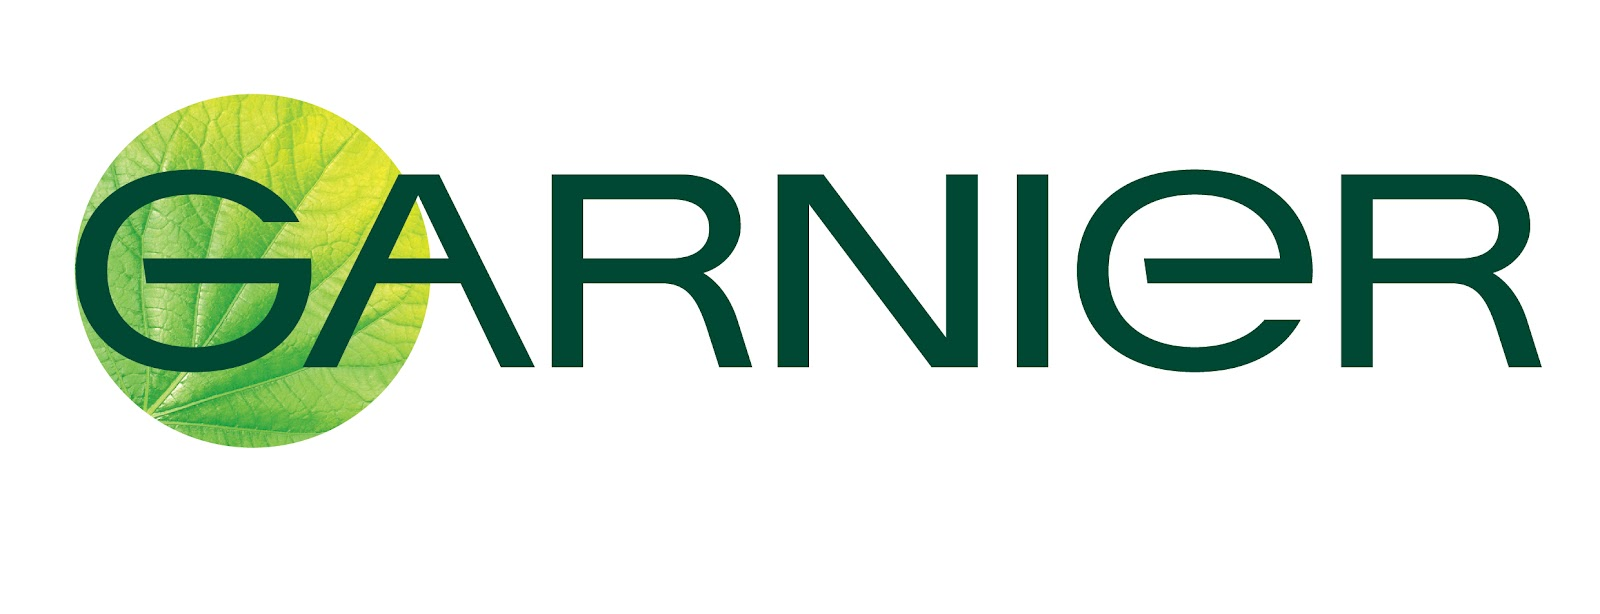 2012-garnier-logo